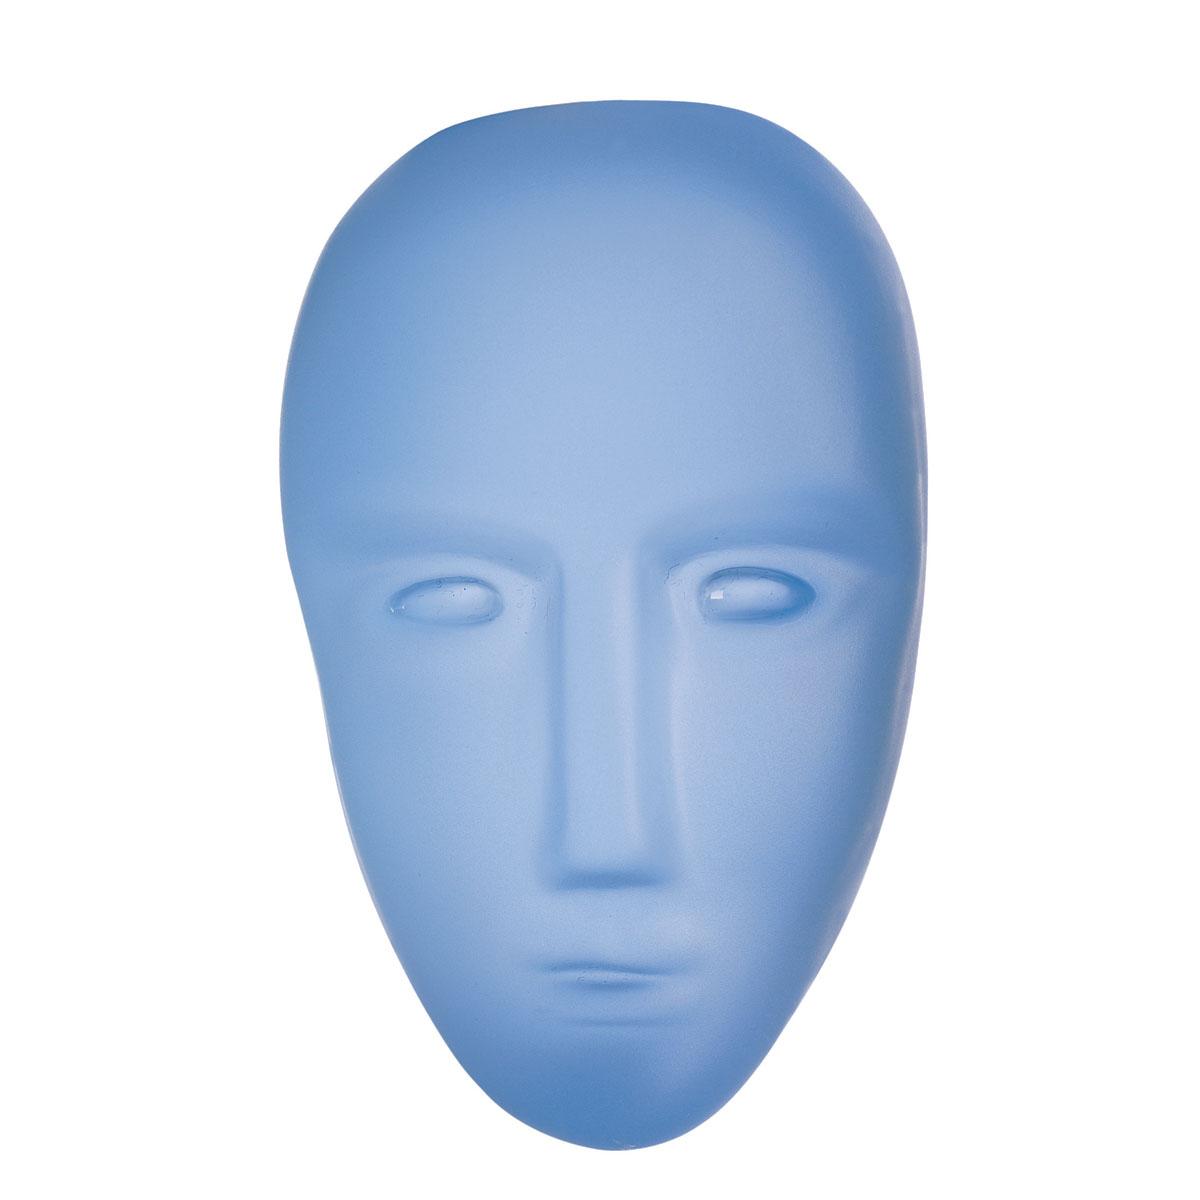 Kosta Boda Art Glass Brains Karolina, Limited Edition